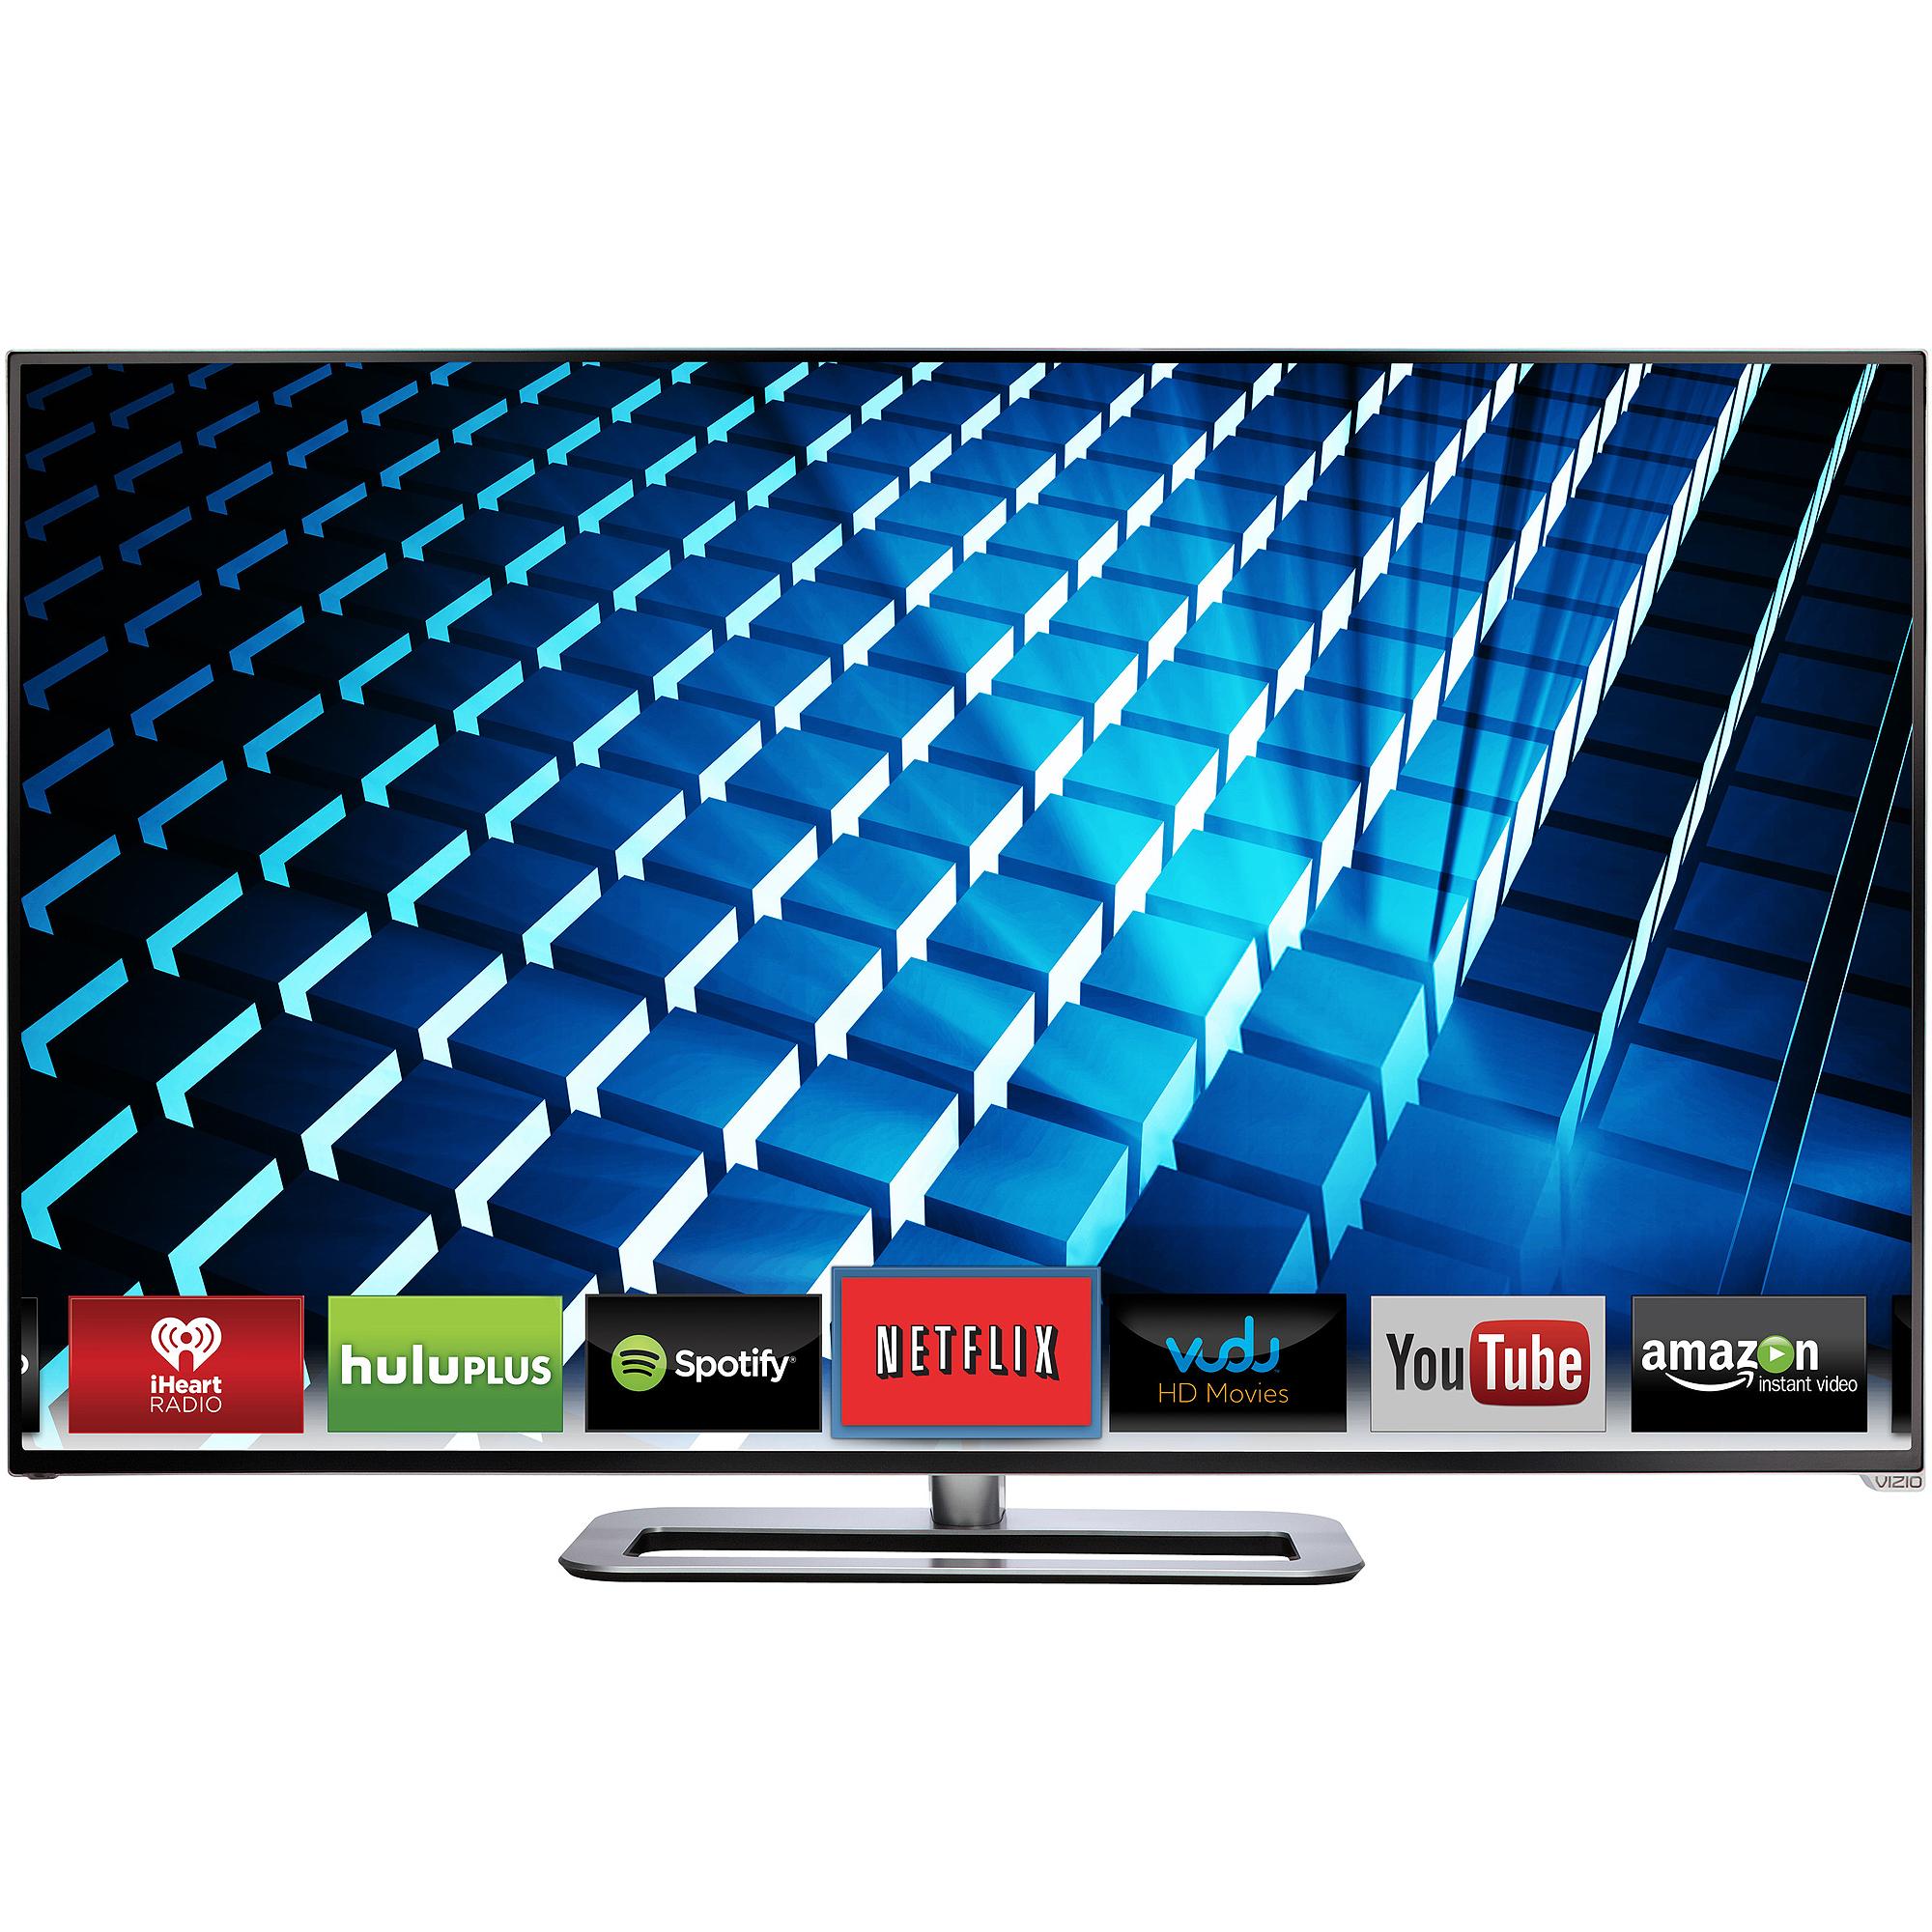 "VIZIO M552i-B2 55"" 1080p 240Hz Class LED Smart HDTV"